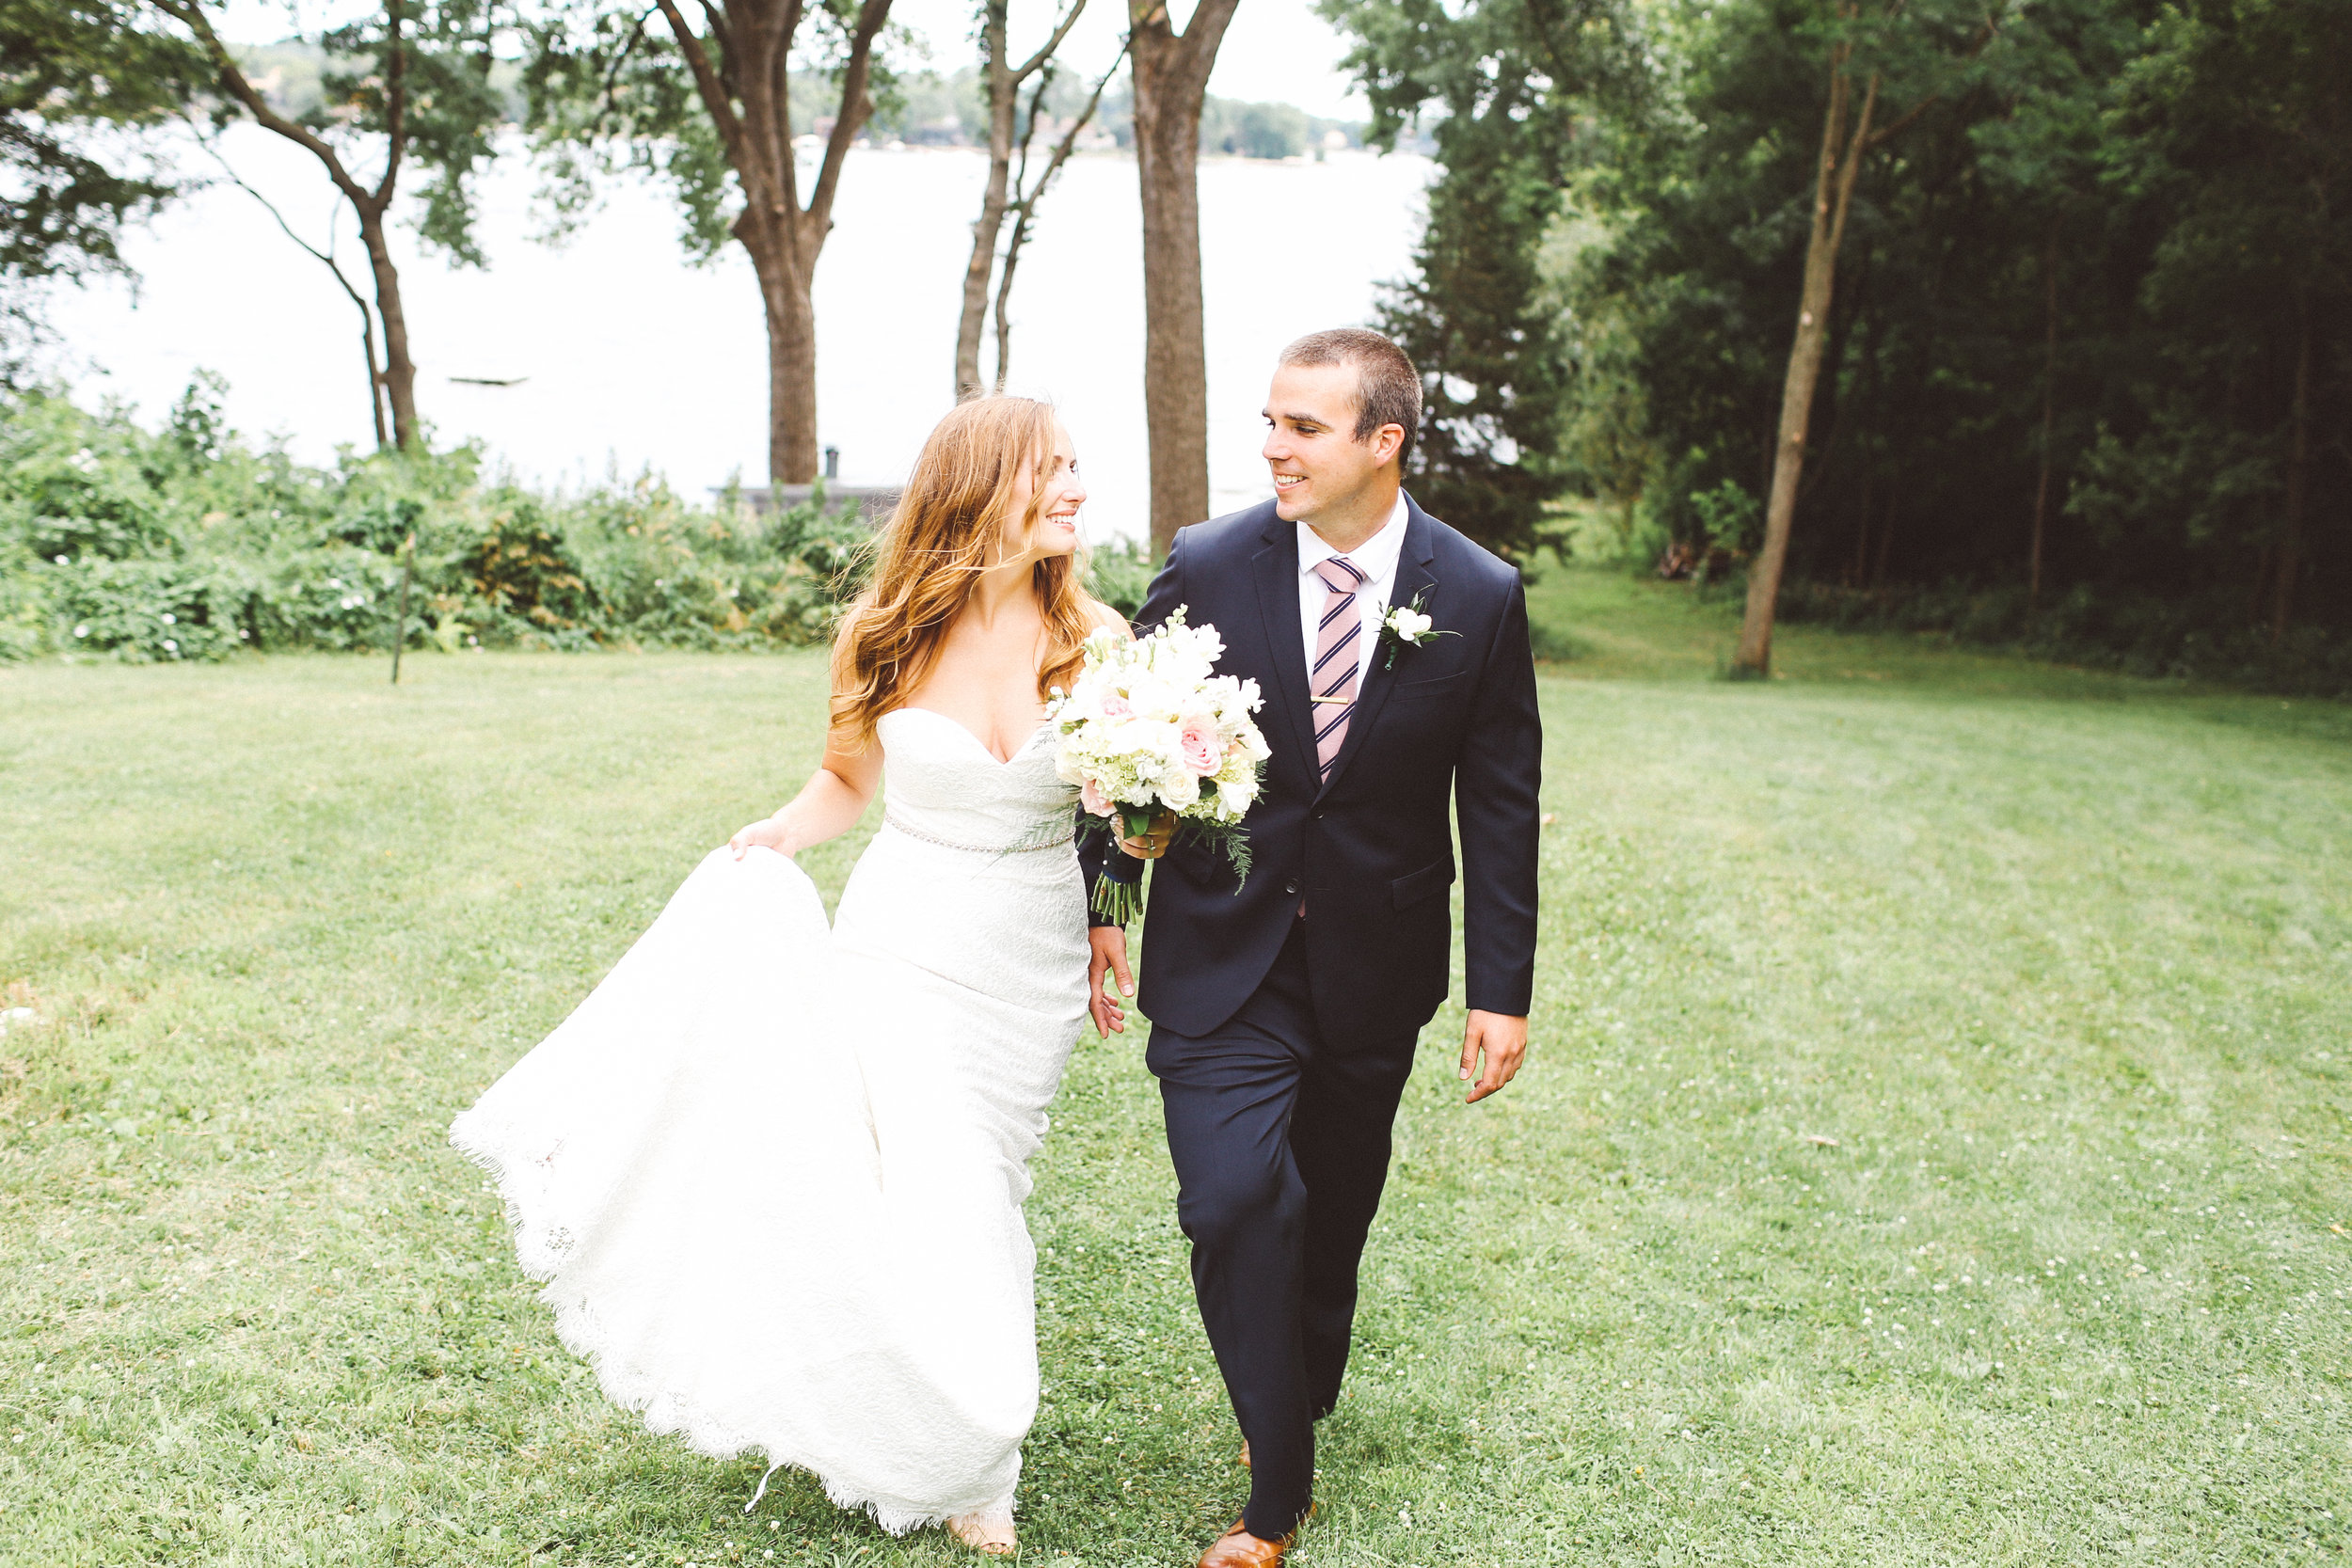 Minneapolis Bride and Groom Running